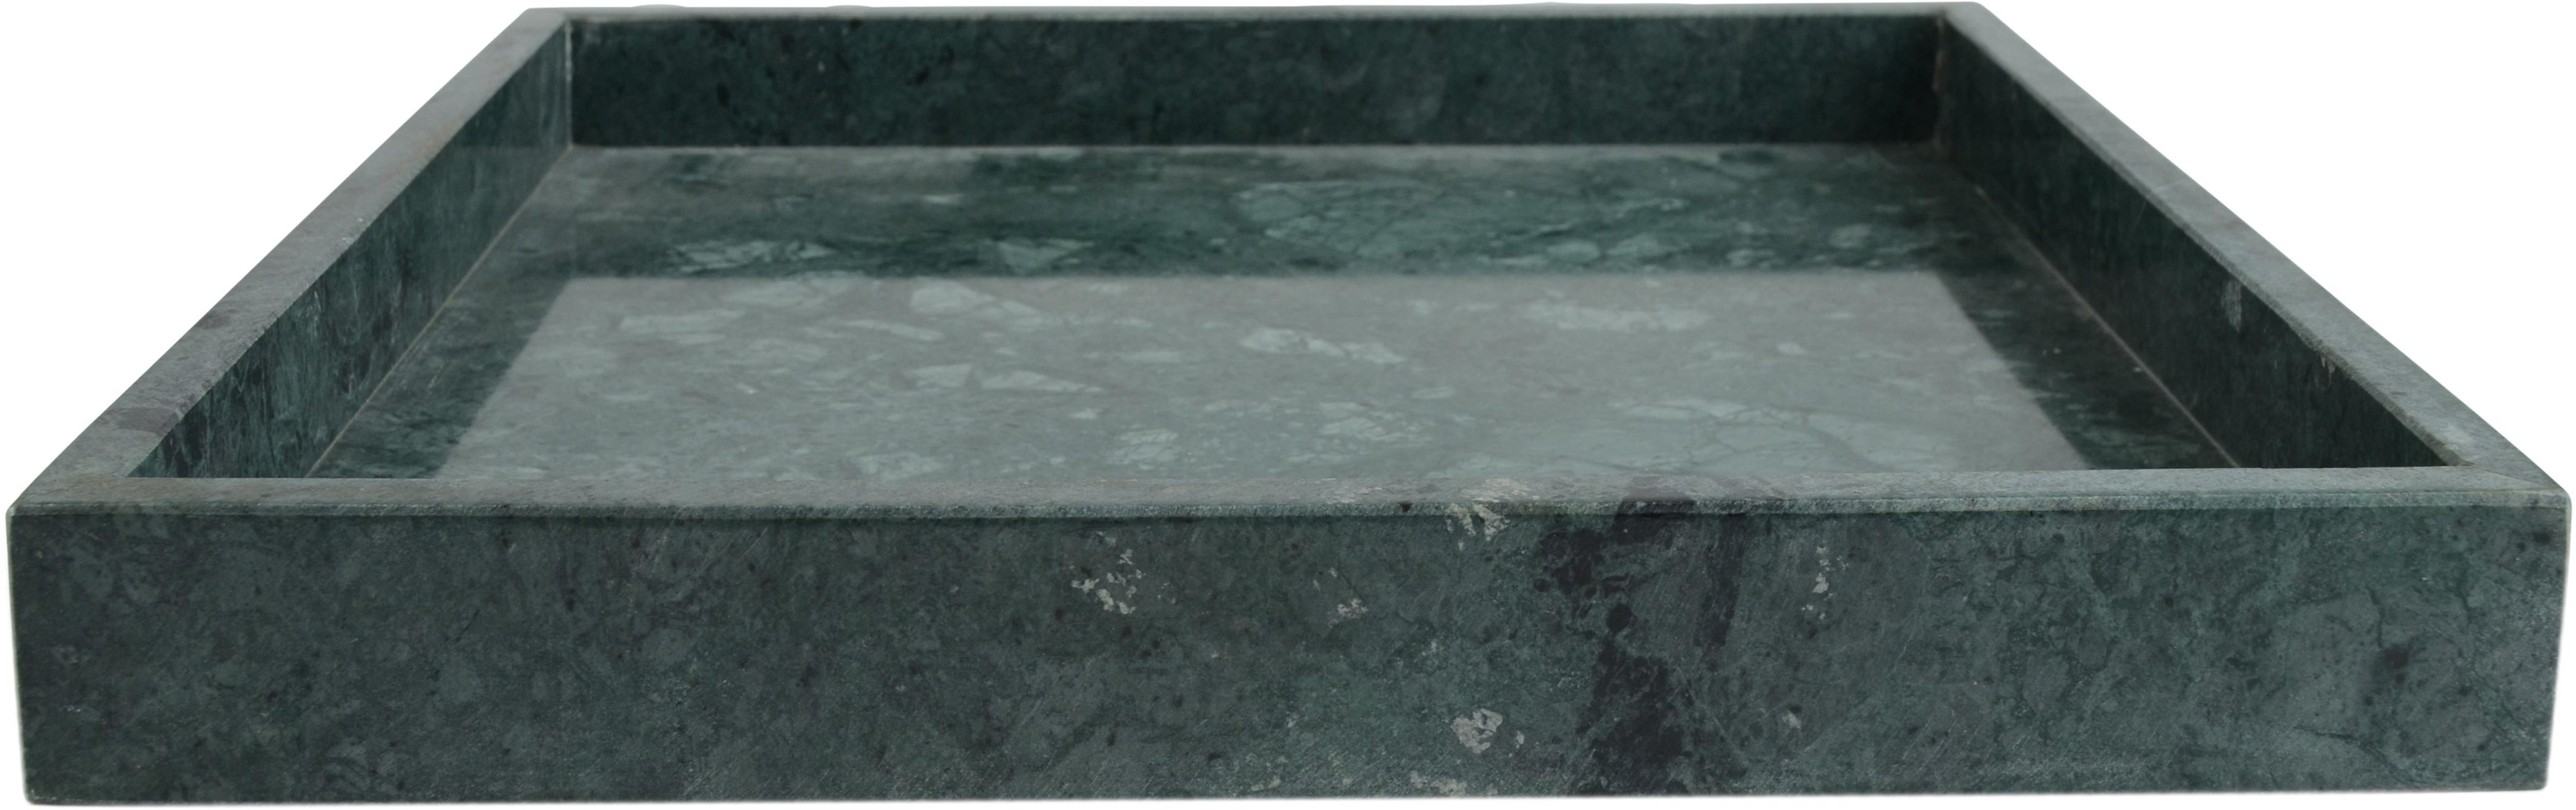 Decoratief marmeren dienblad Ciaran, Marmer, Gemarmerd groen, B 30 x D 30 cm